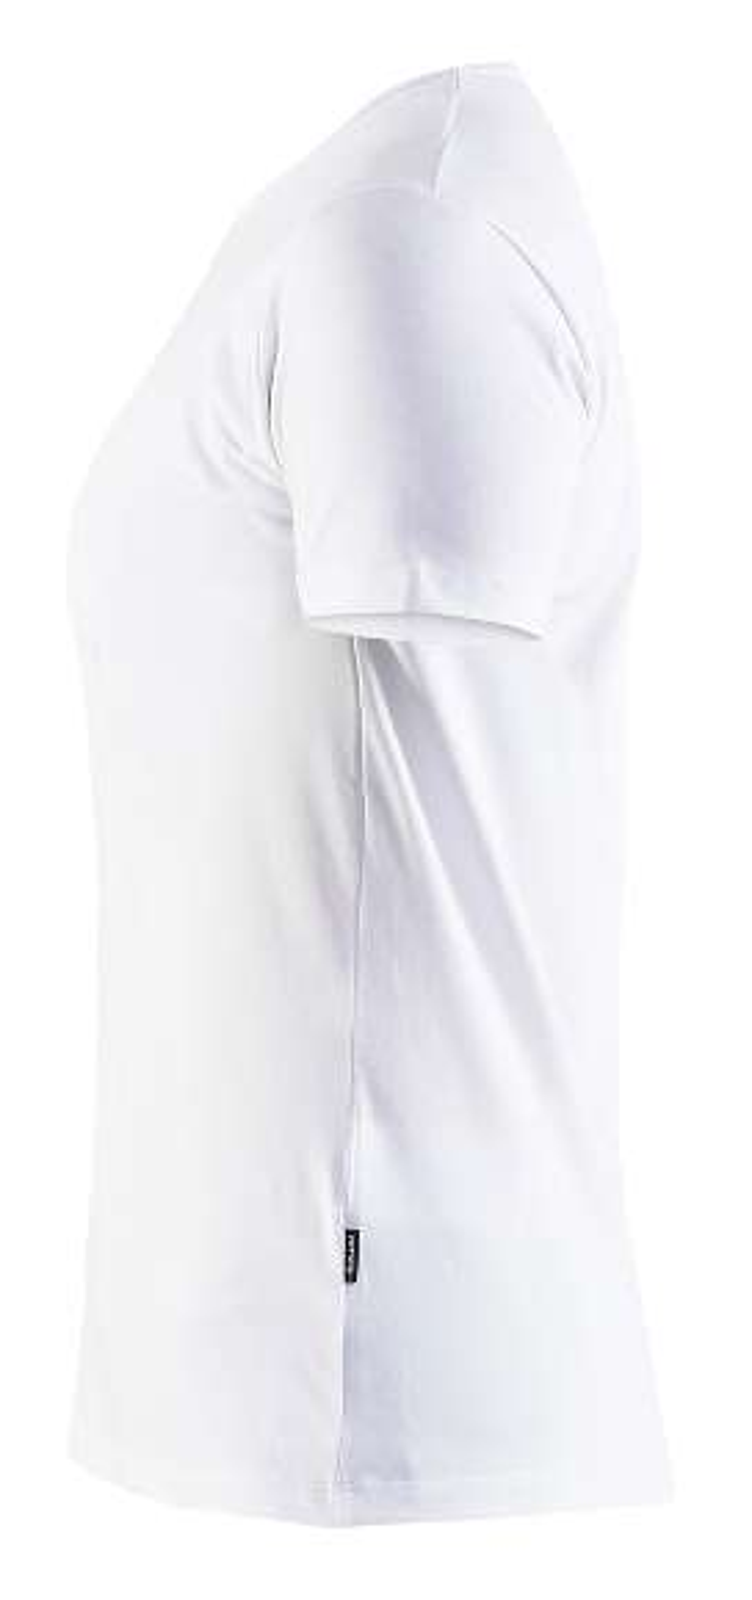 Blaklader Dames T-shirts 33041029 wit(1000)